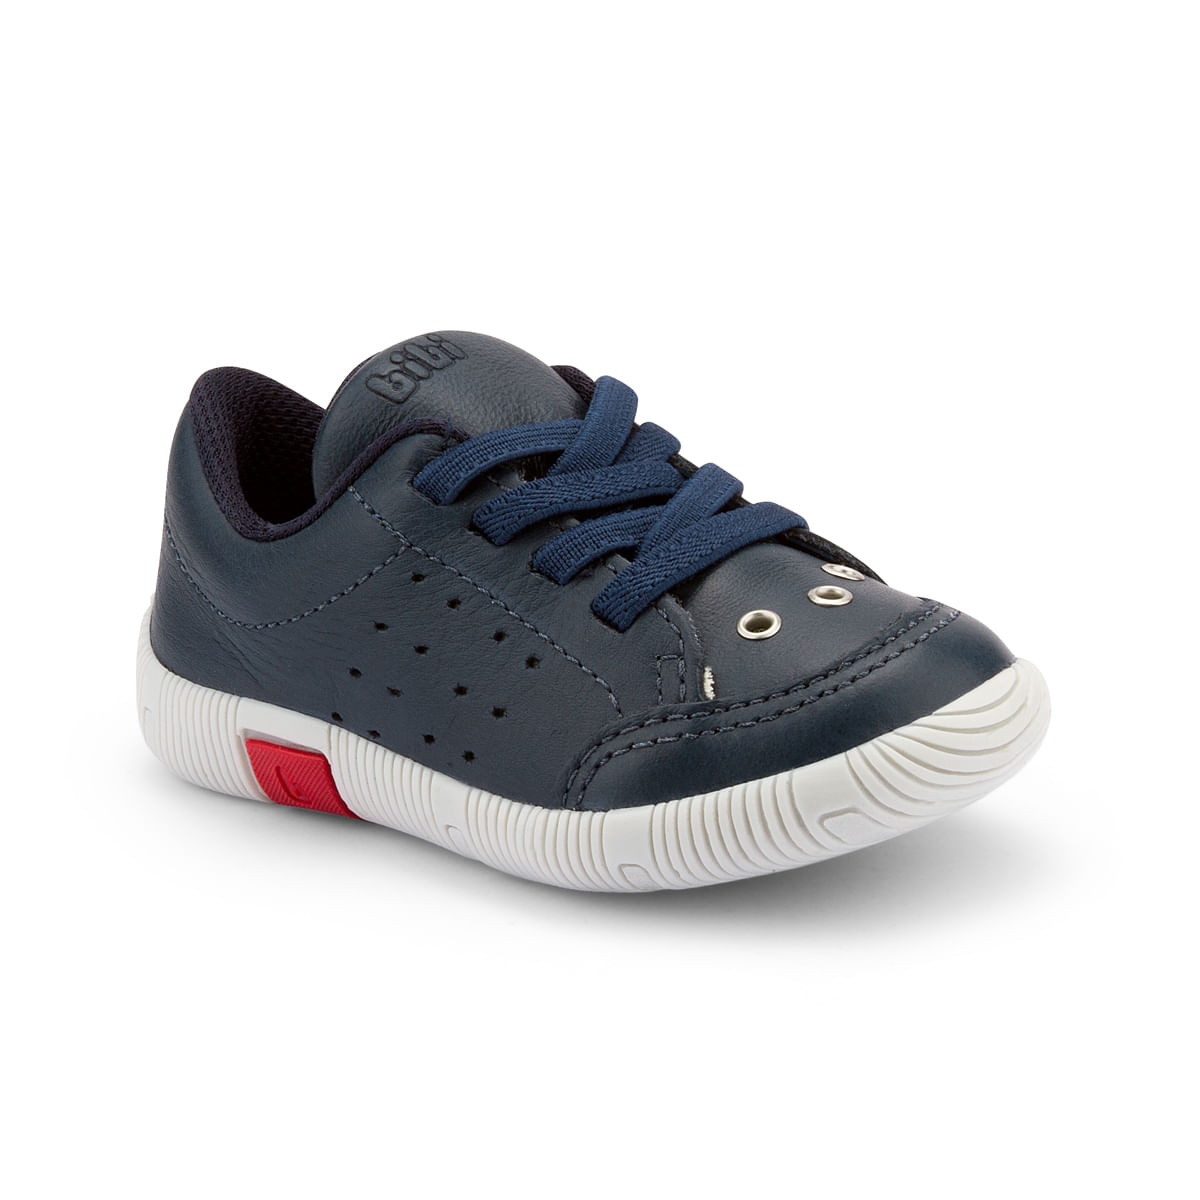 52899ceb3e2 Sapatênis Infantil Bibi Masculino Azul Walk Baby 844174 - Bibi Calçados